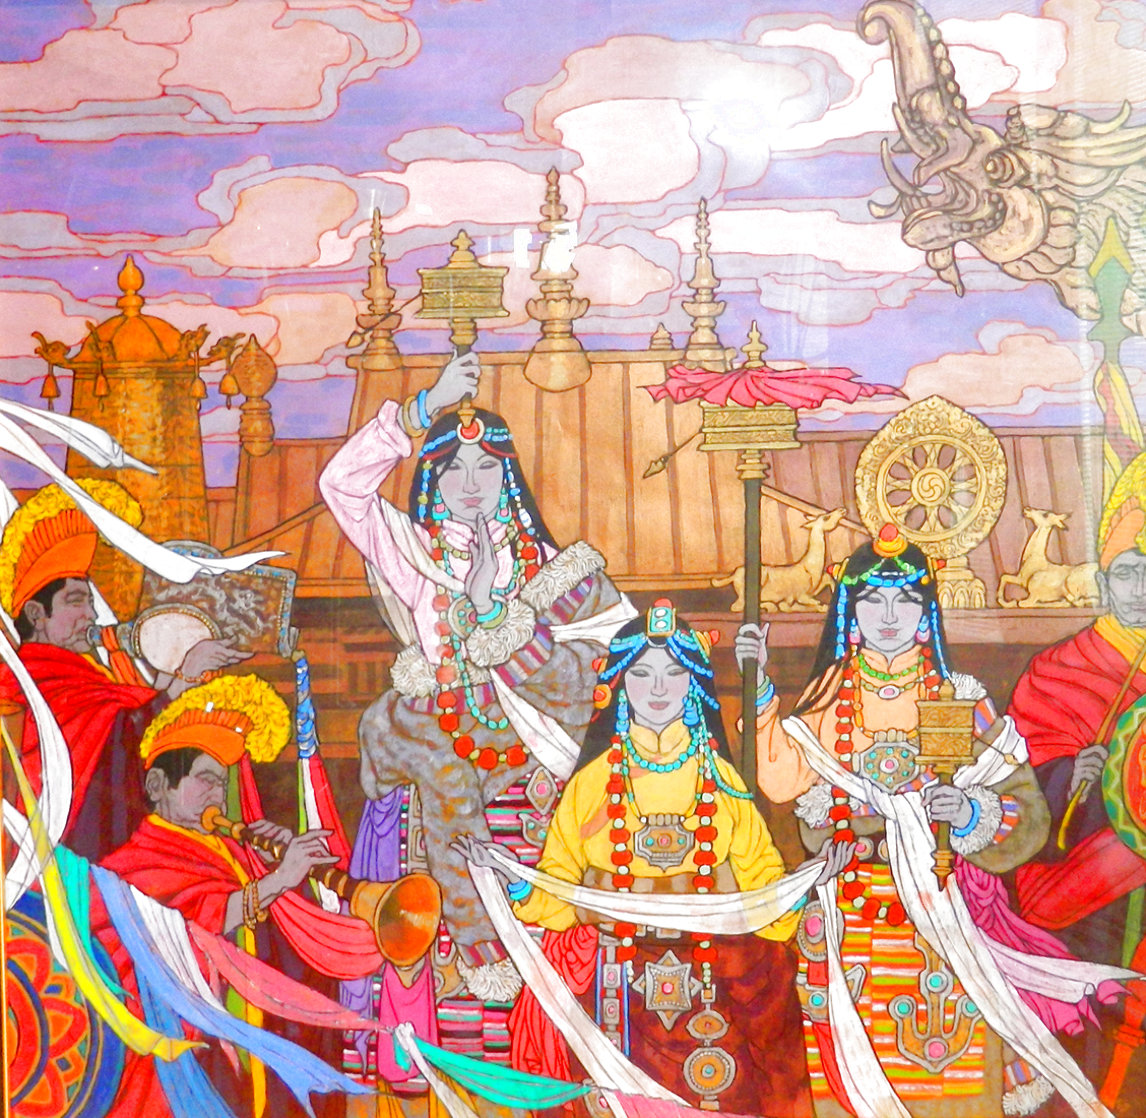 Golden Fortunes 35x35 Super Huge Original Painting by Zu Ming Ho